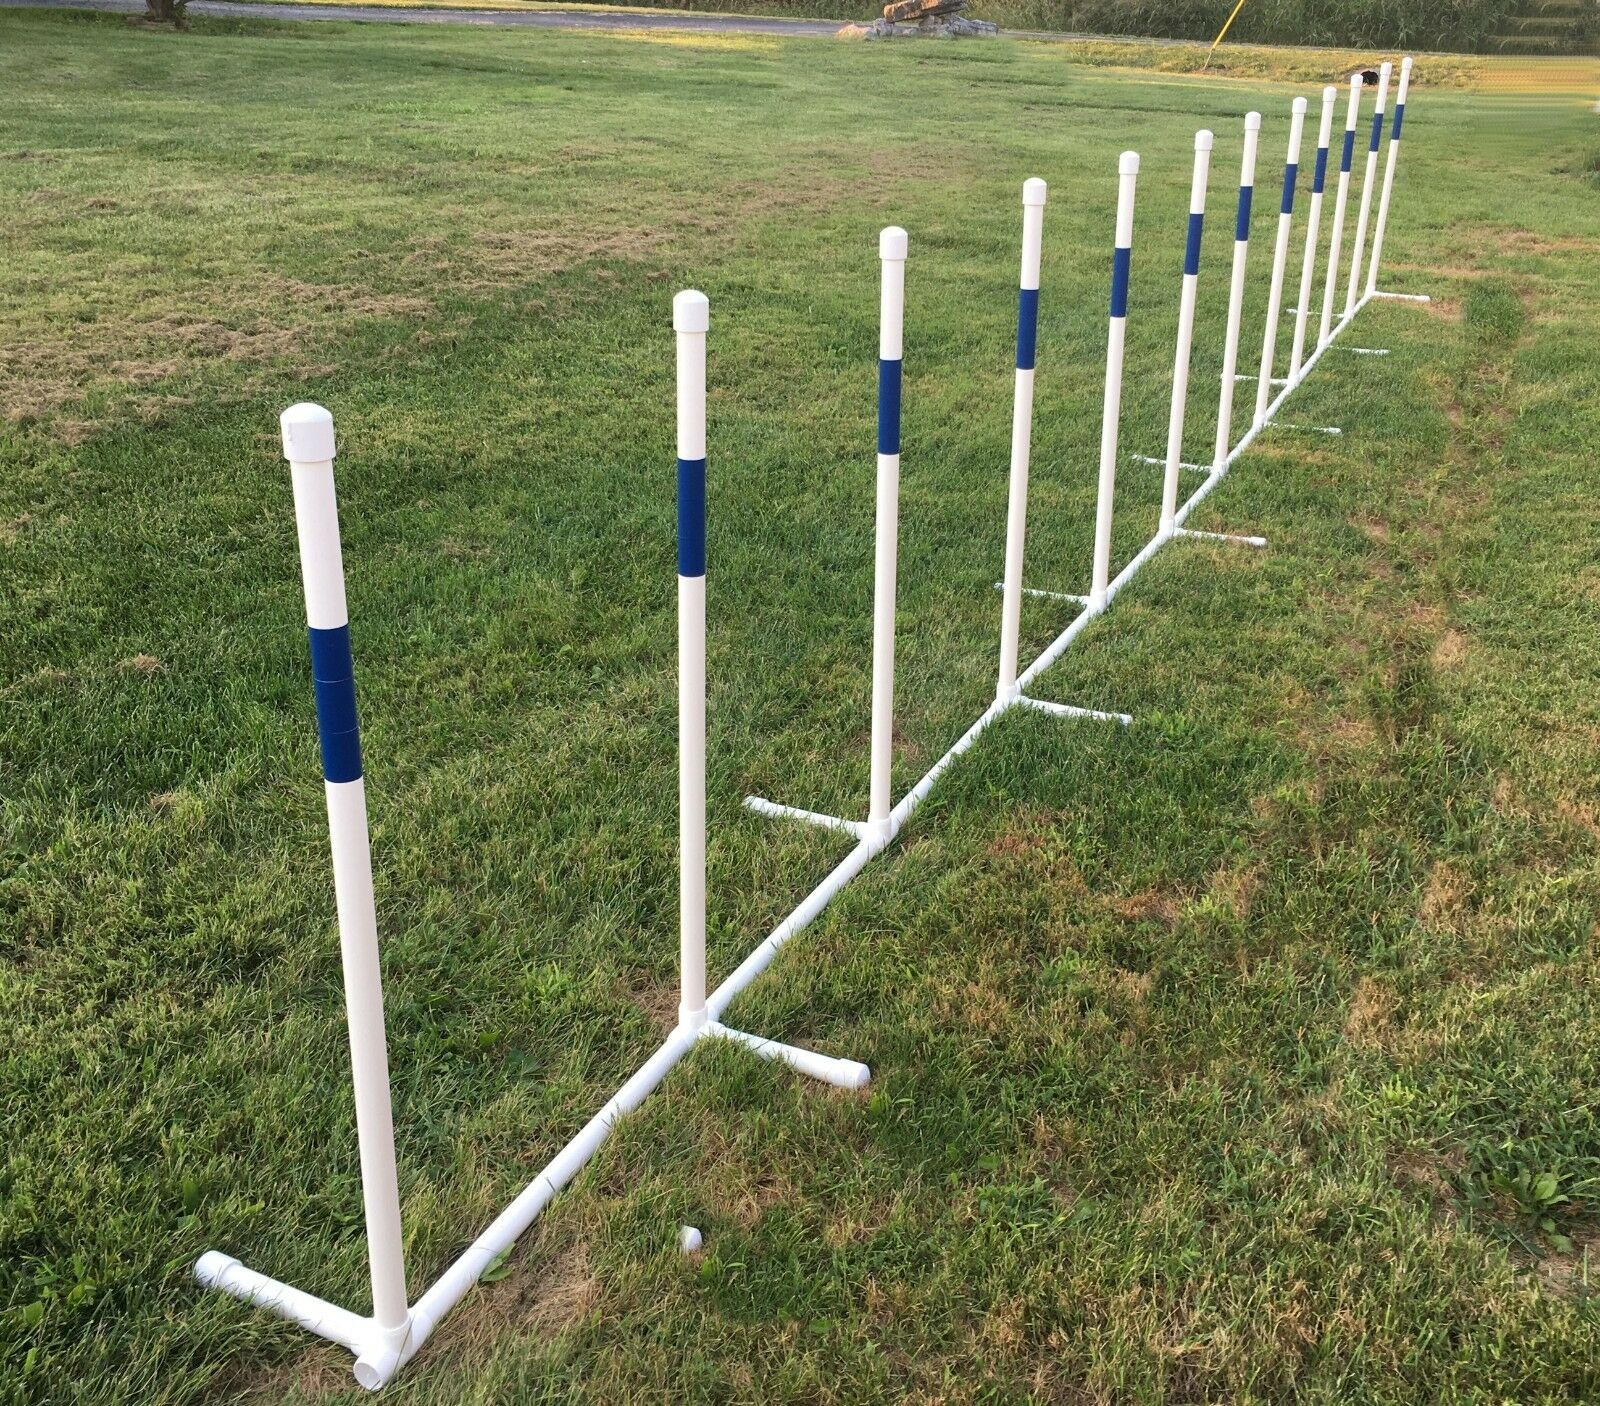 Dog agility weave poles - 12 poles, 1  pvc